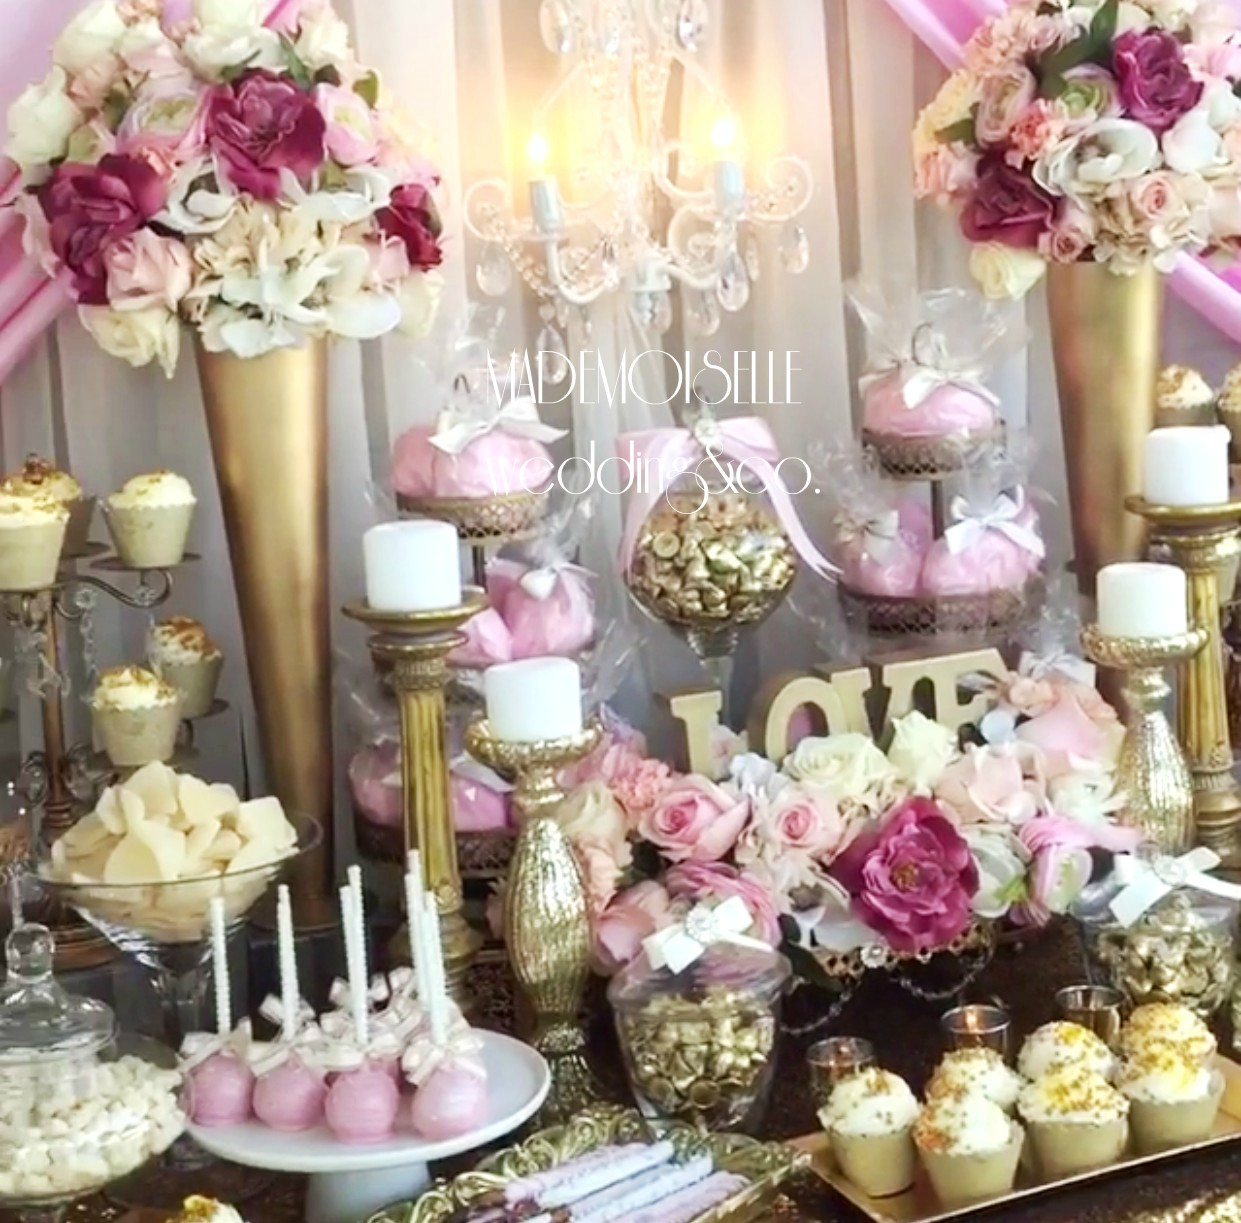 Slatki sto-dekoracija za slatki sto-dekoracija slatkog stola-kolaci-cupecakes-roze pink zlatna dekoracija slatkog stola-muffins-cakepops